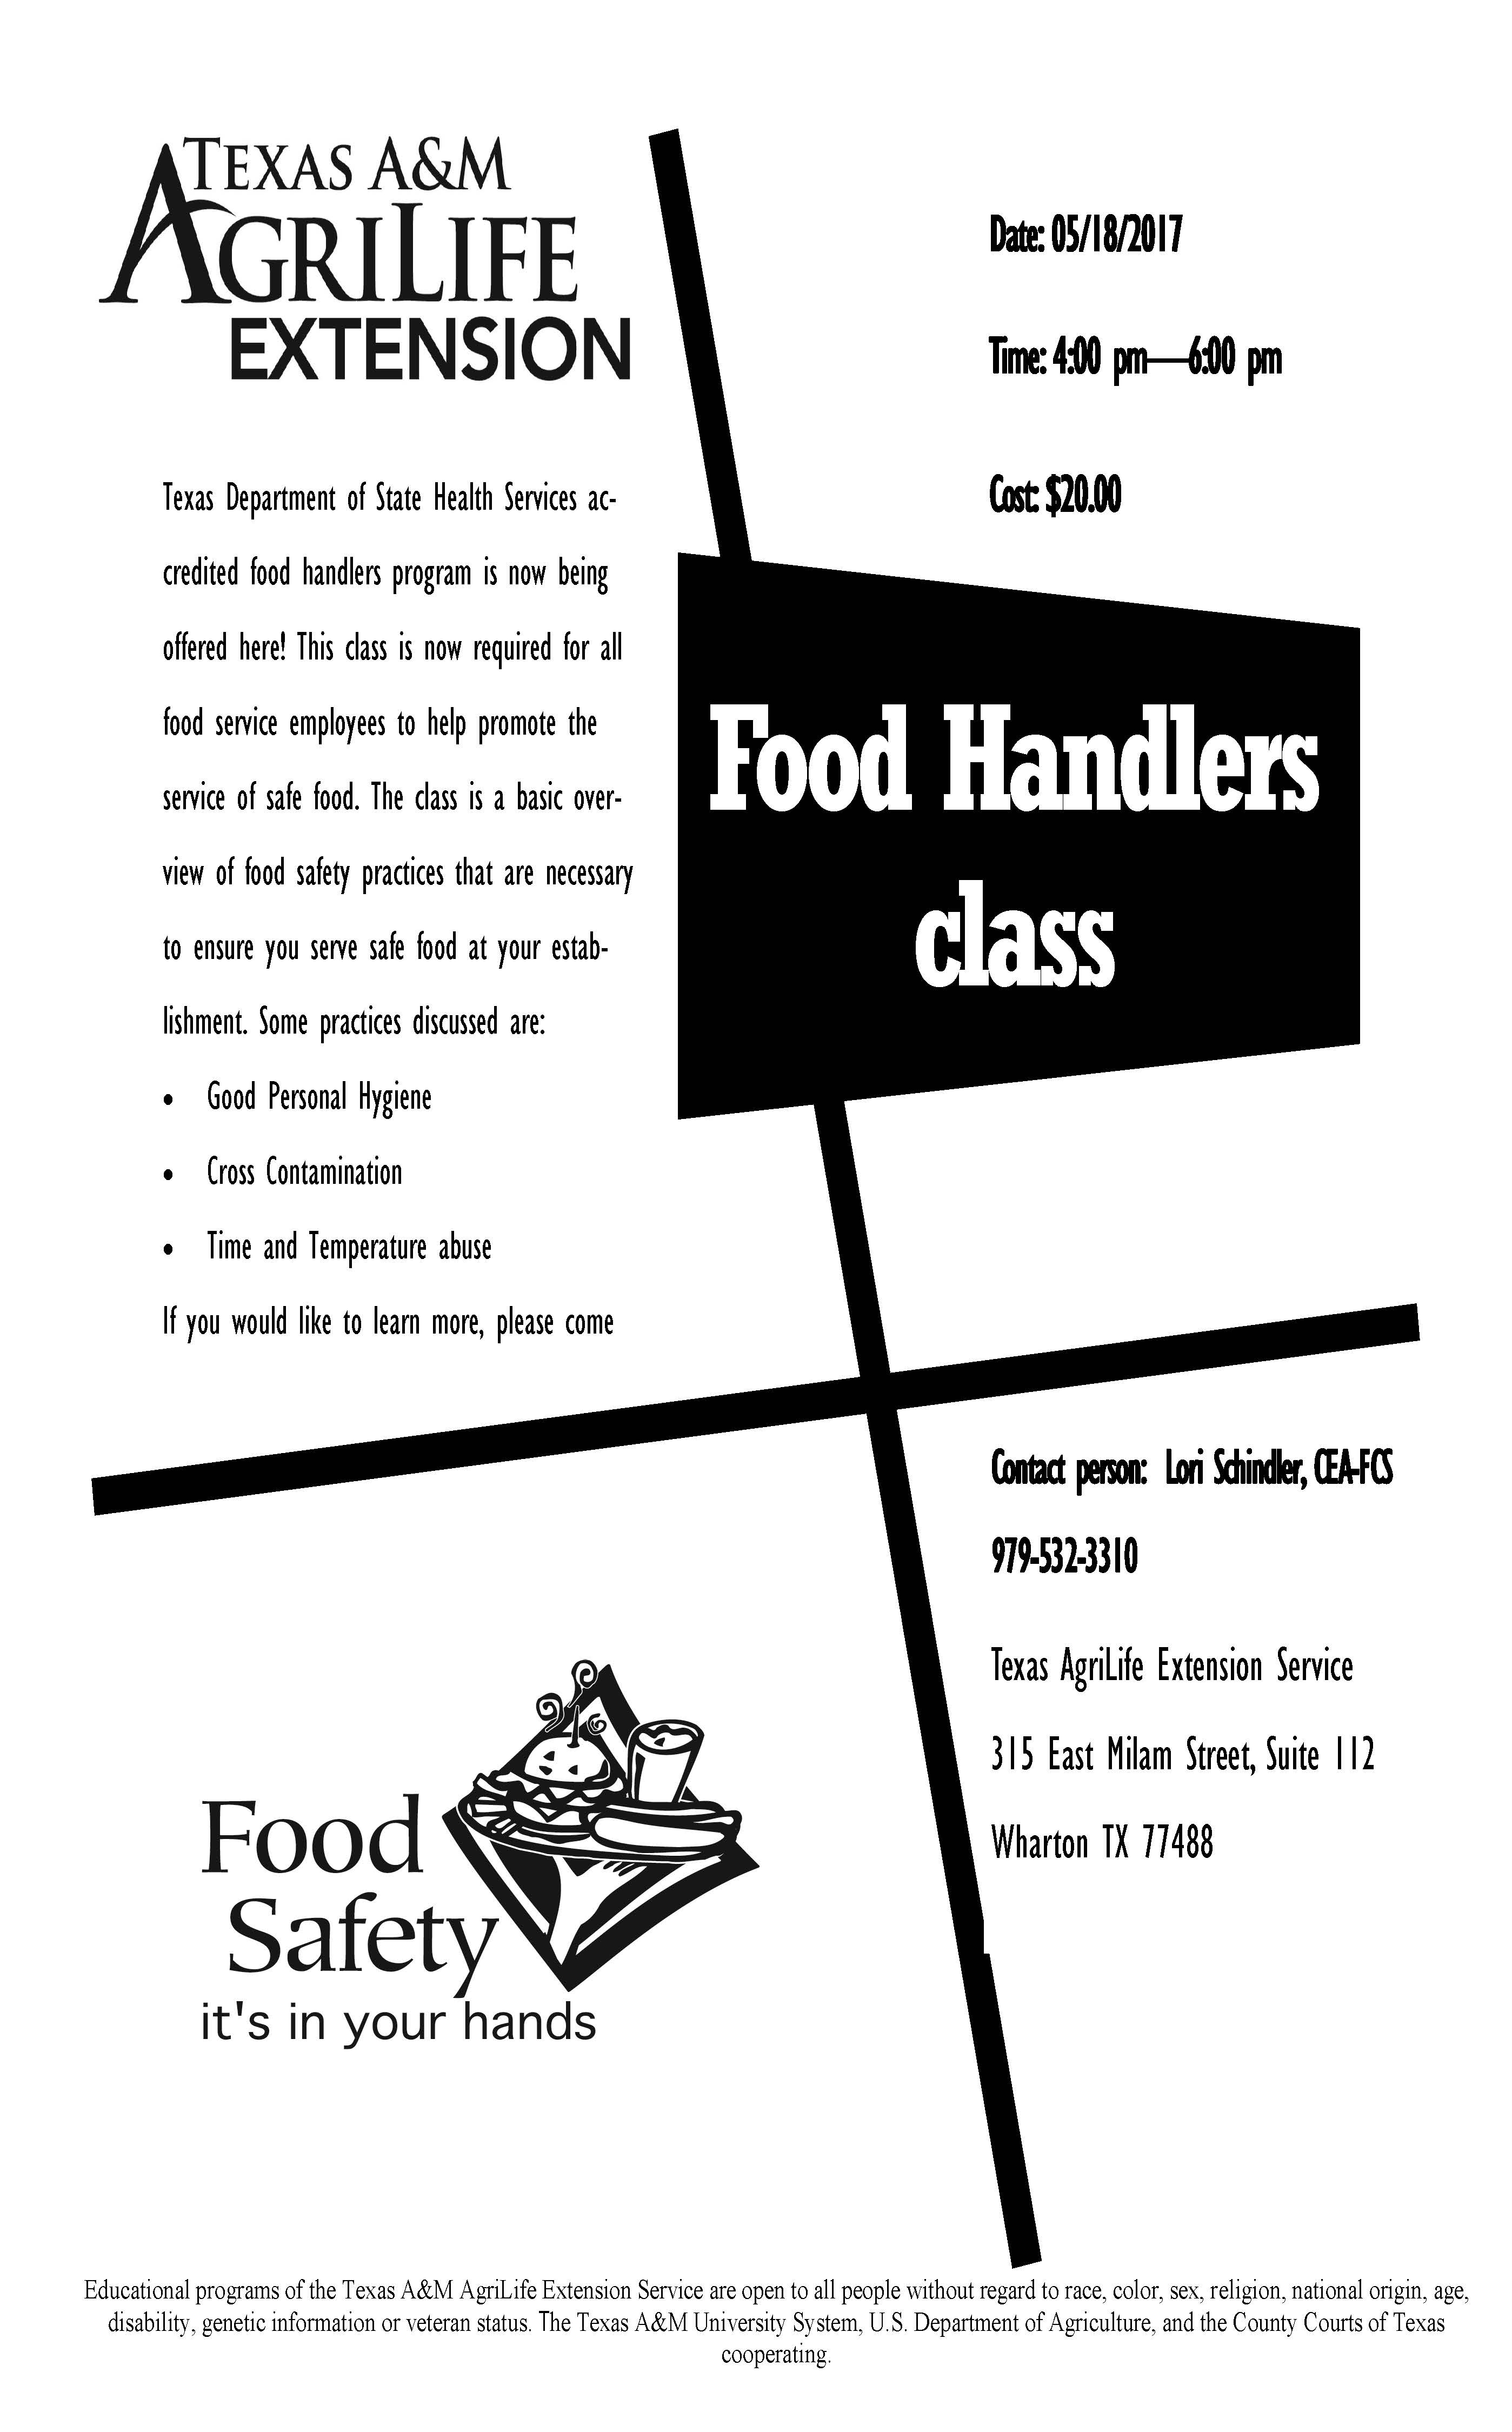 Food Handlers Class